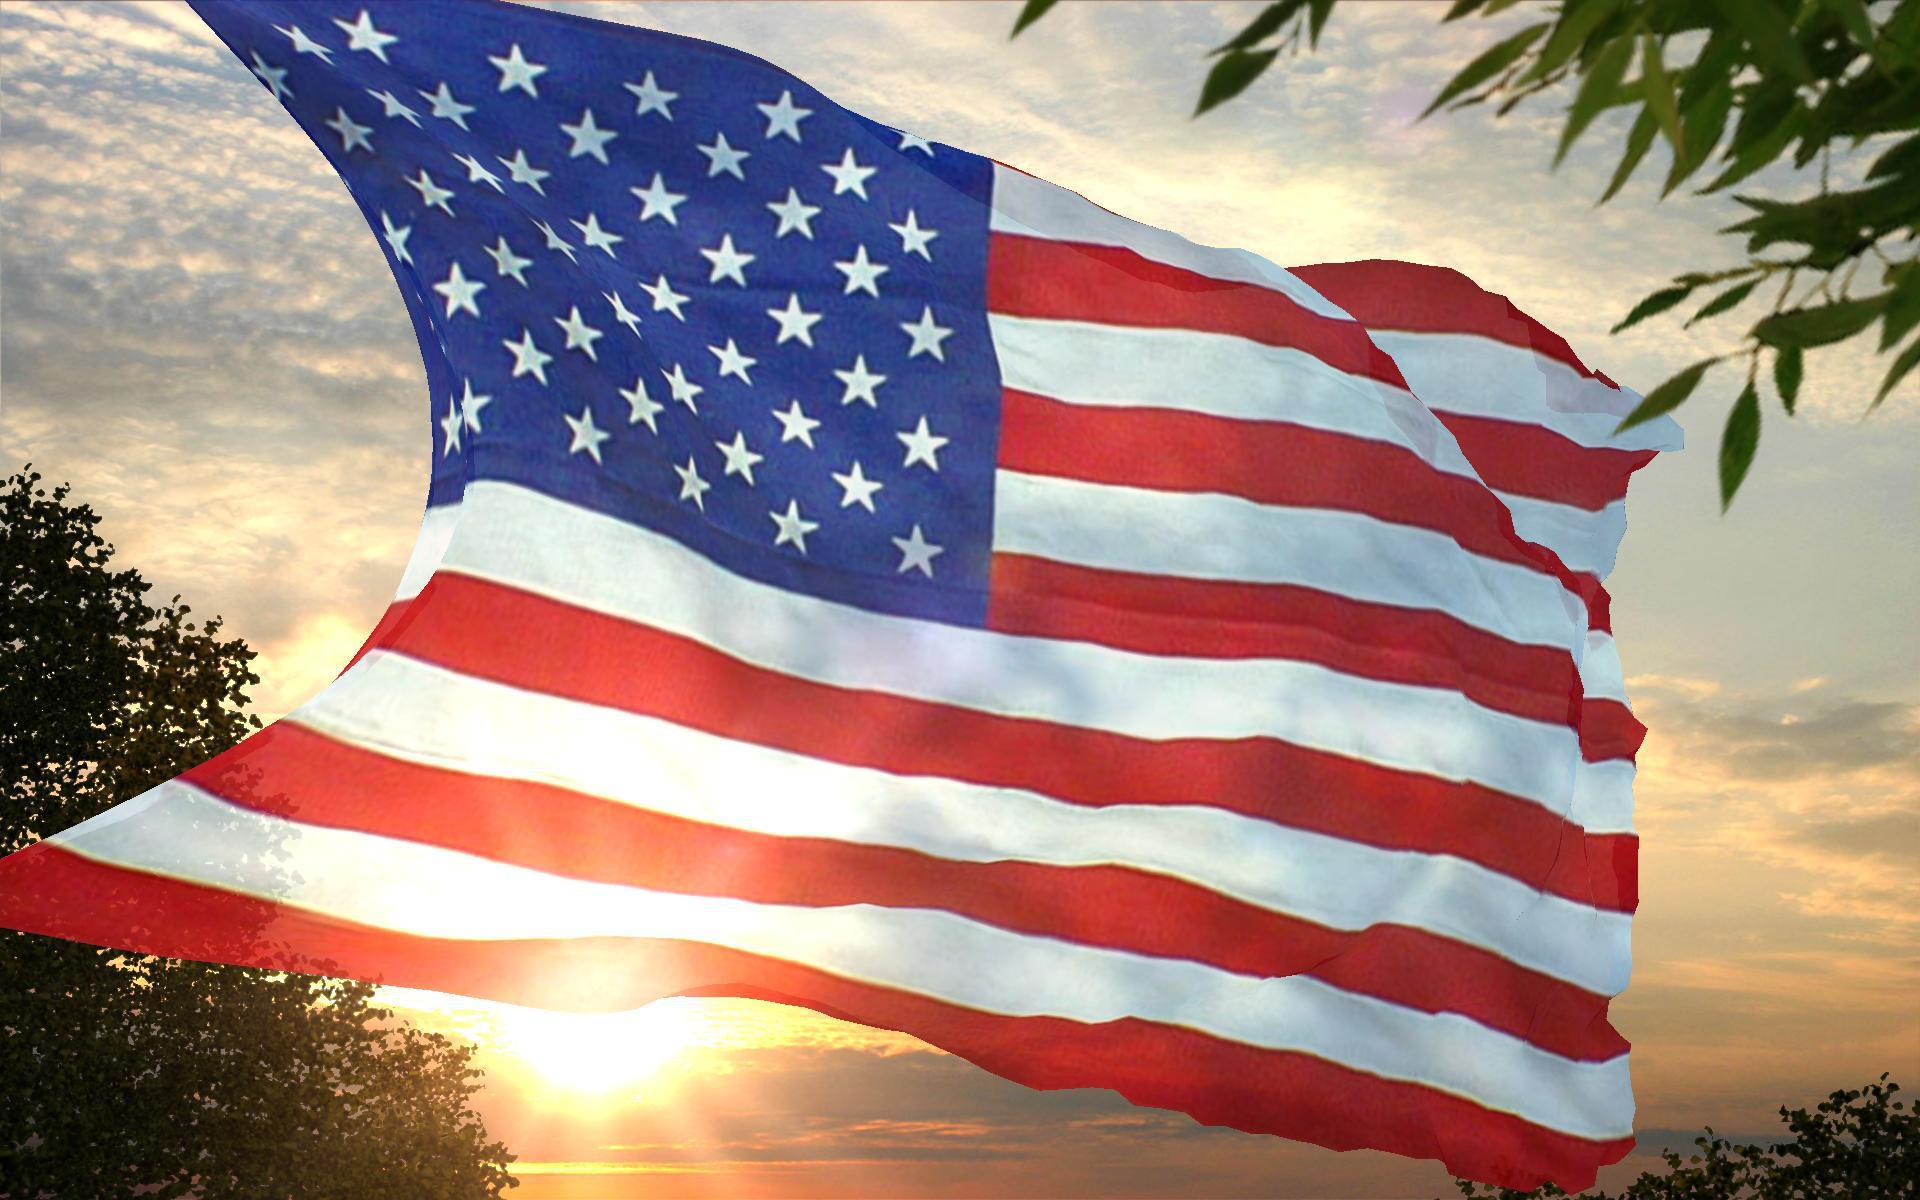 Hd wallpaper usa flag - American Flag Hd Wallpaper